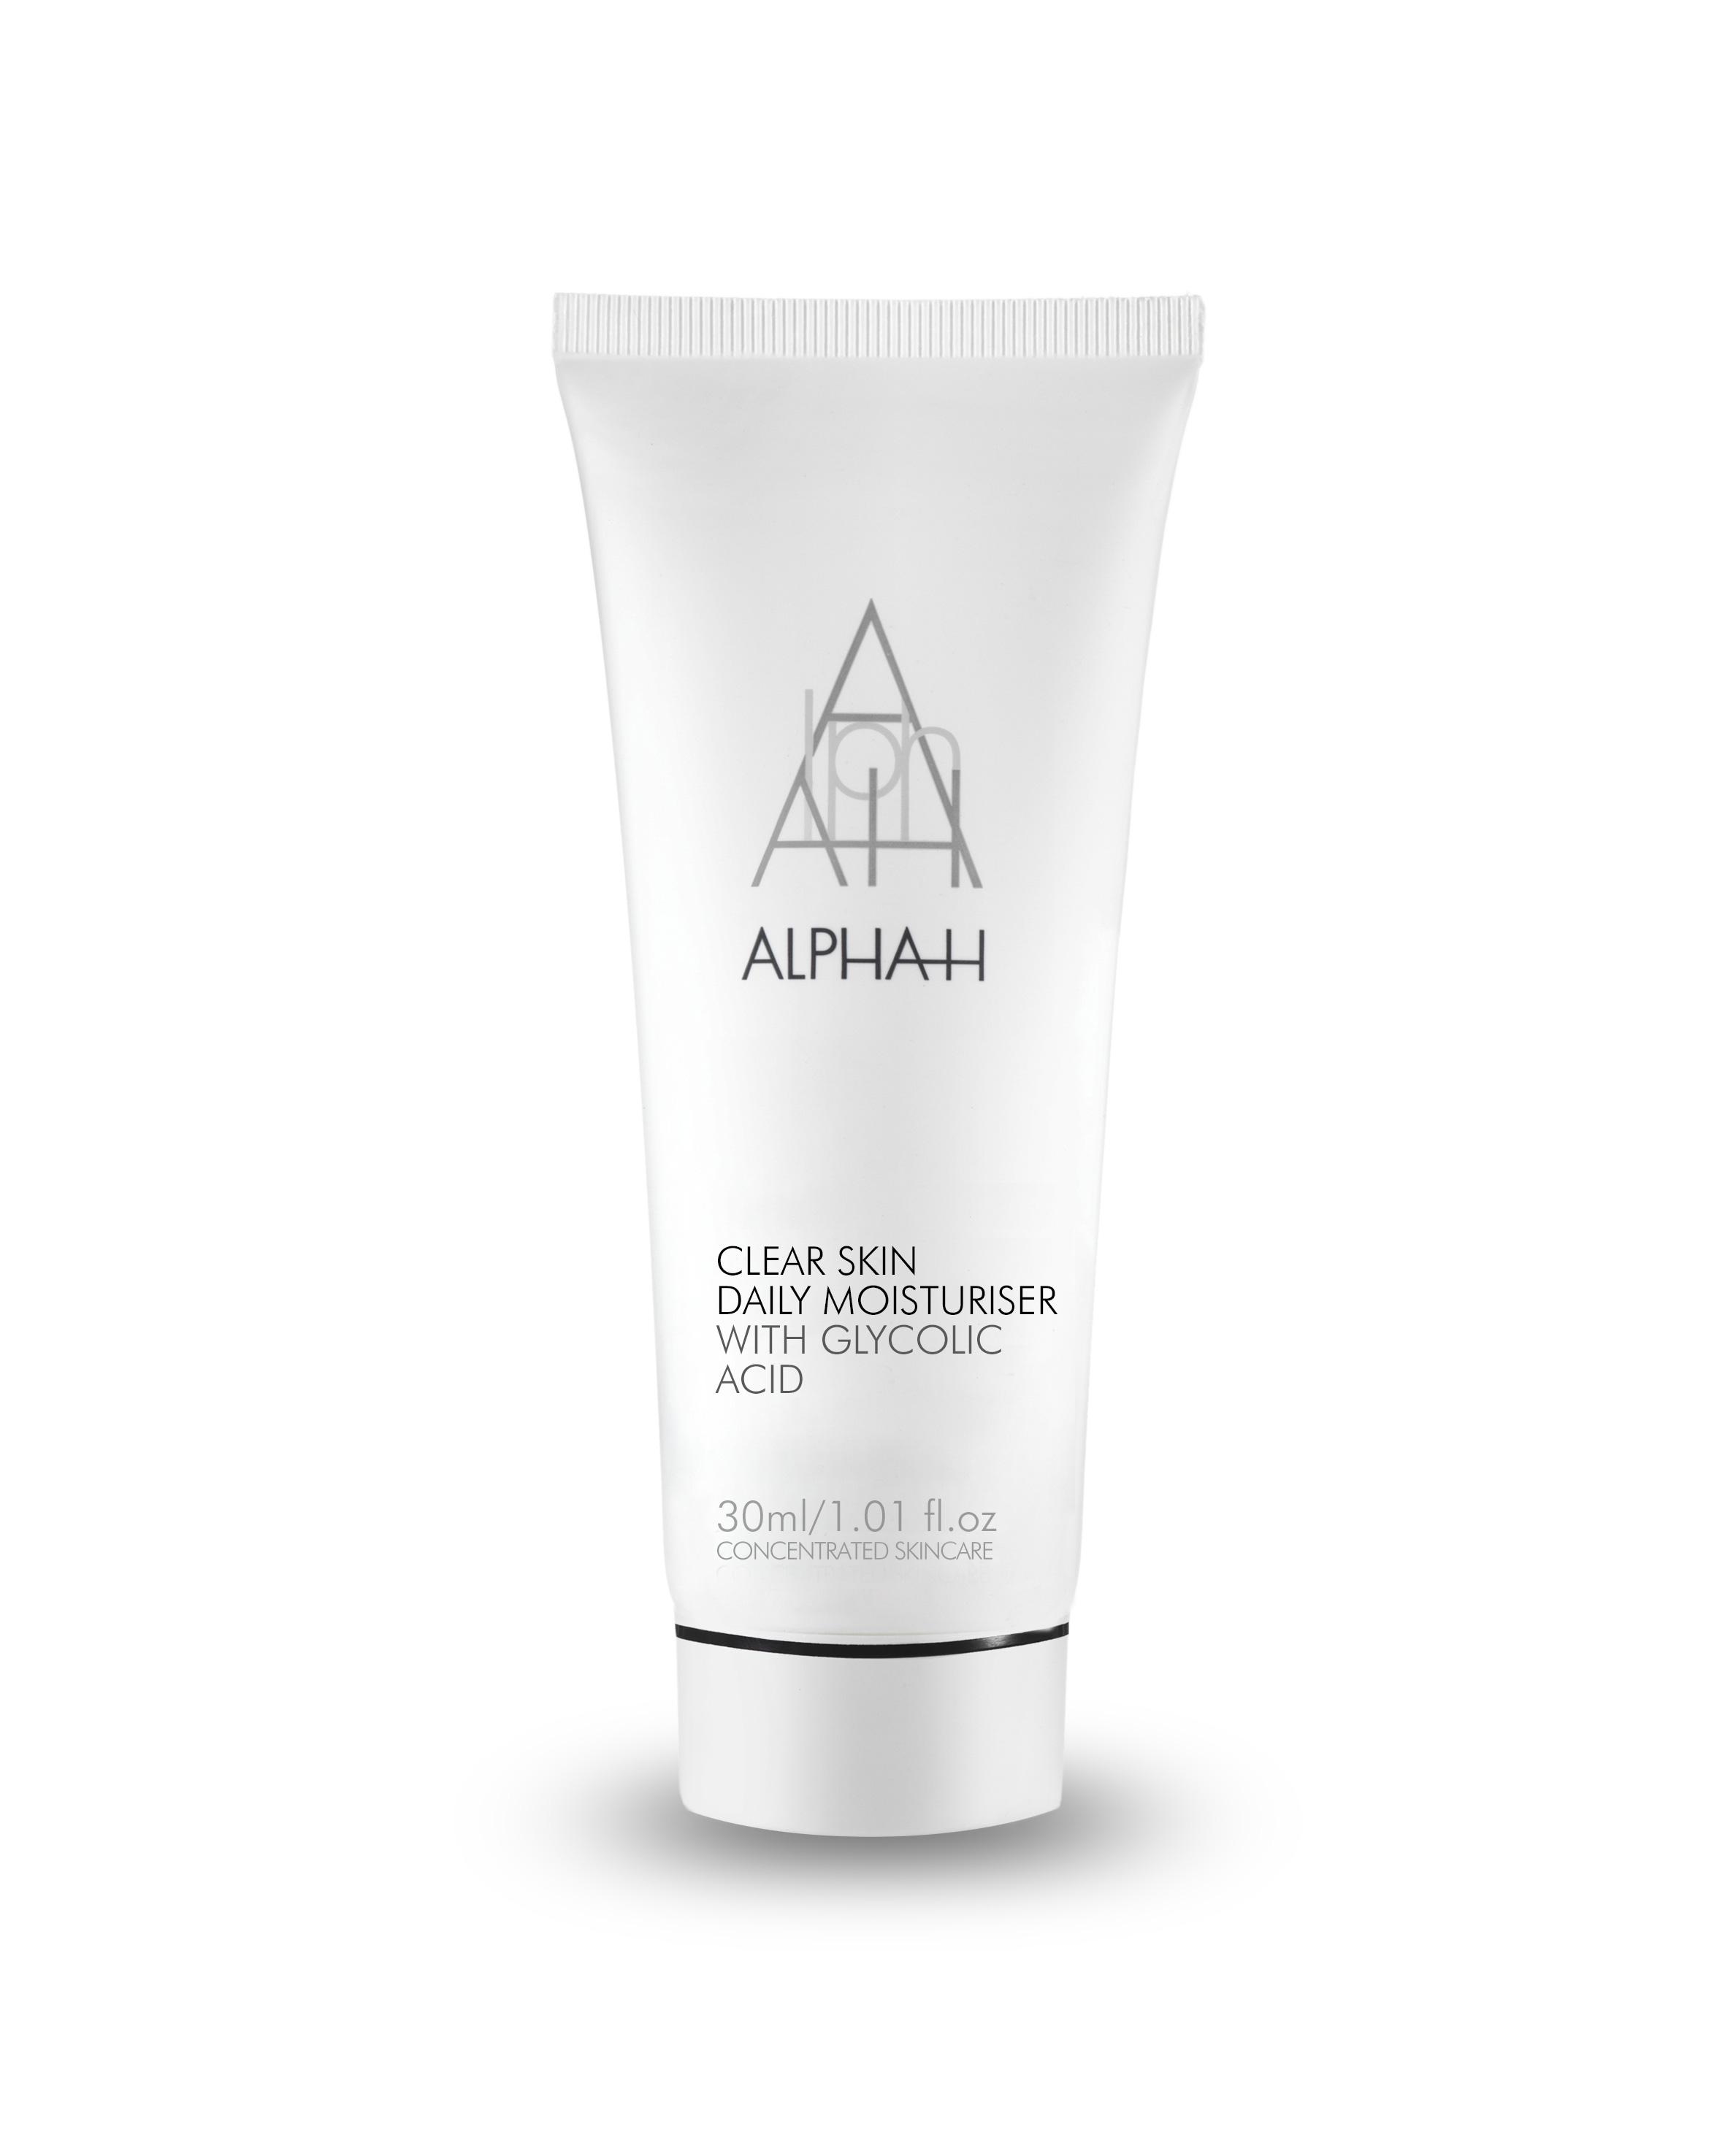 Alpha H clear skin daily moisturiser